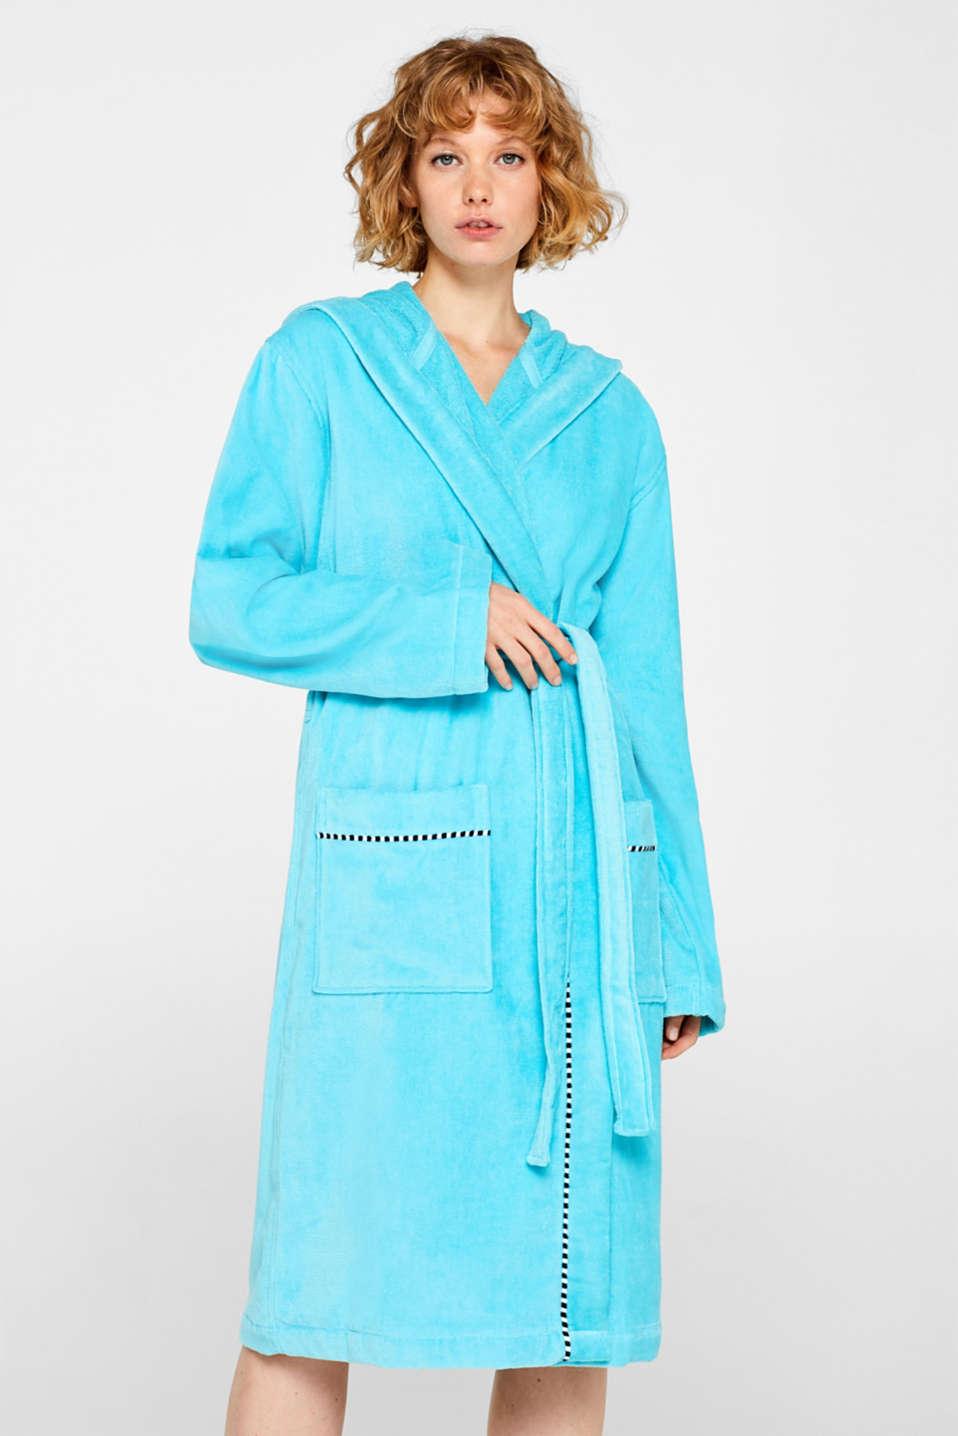 Unisex bathrobe made of 100% cotton, TURQUOISE, detail image number 1